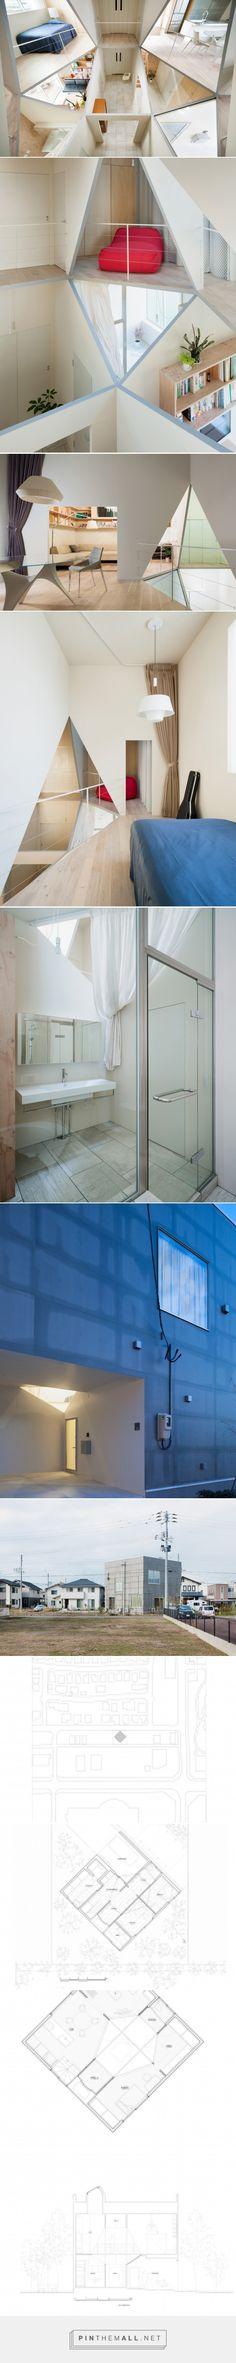 kame house by kochi architect's studio has a hexagonal void - created via http://pinthemall.net